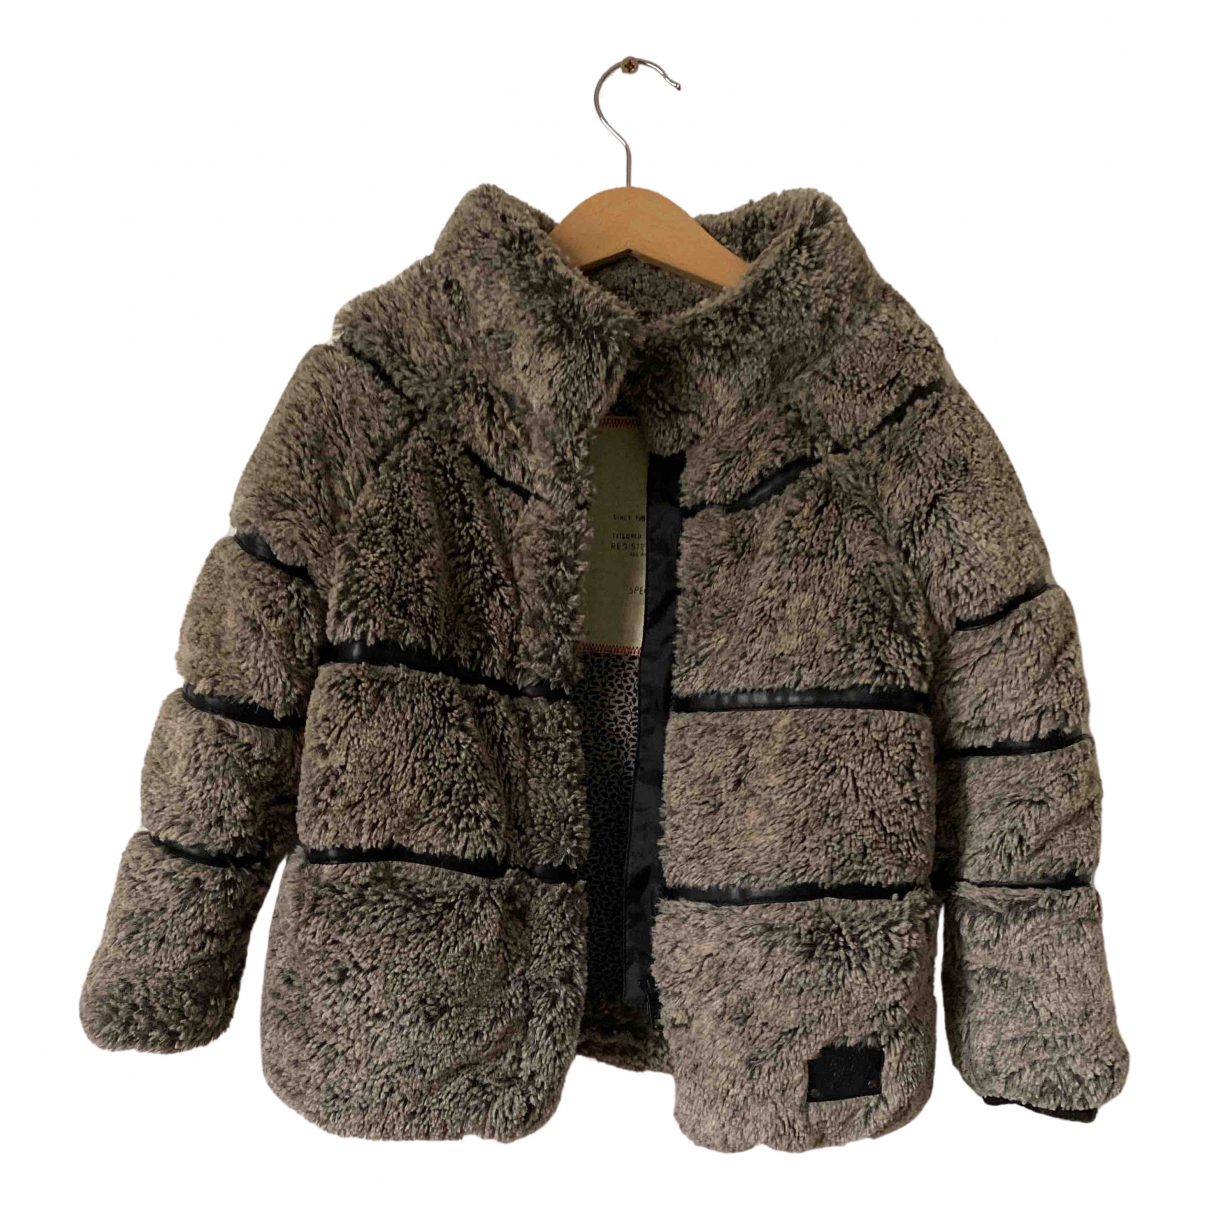 Ikks N Grey Faux fur jacket & coat for Kids 4 years - up to 102cm FR